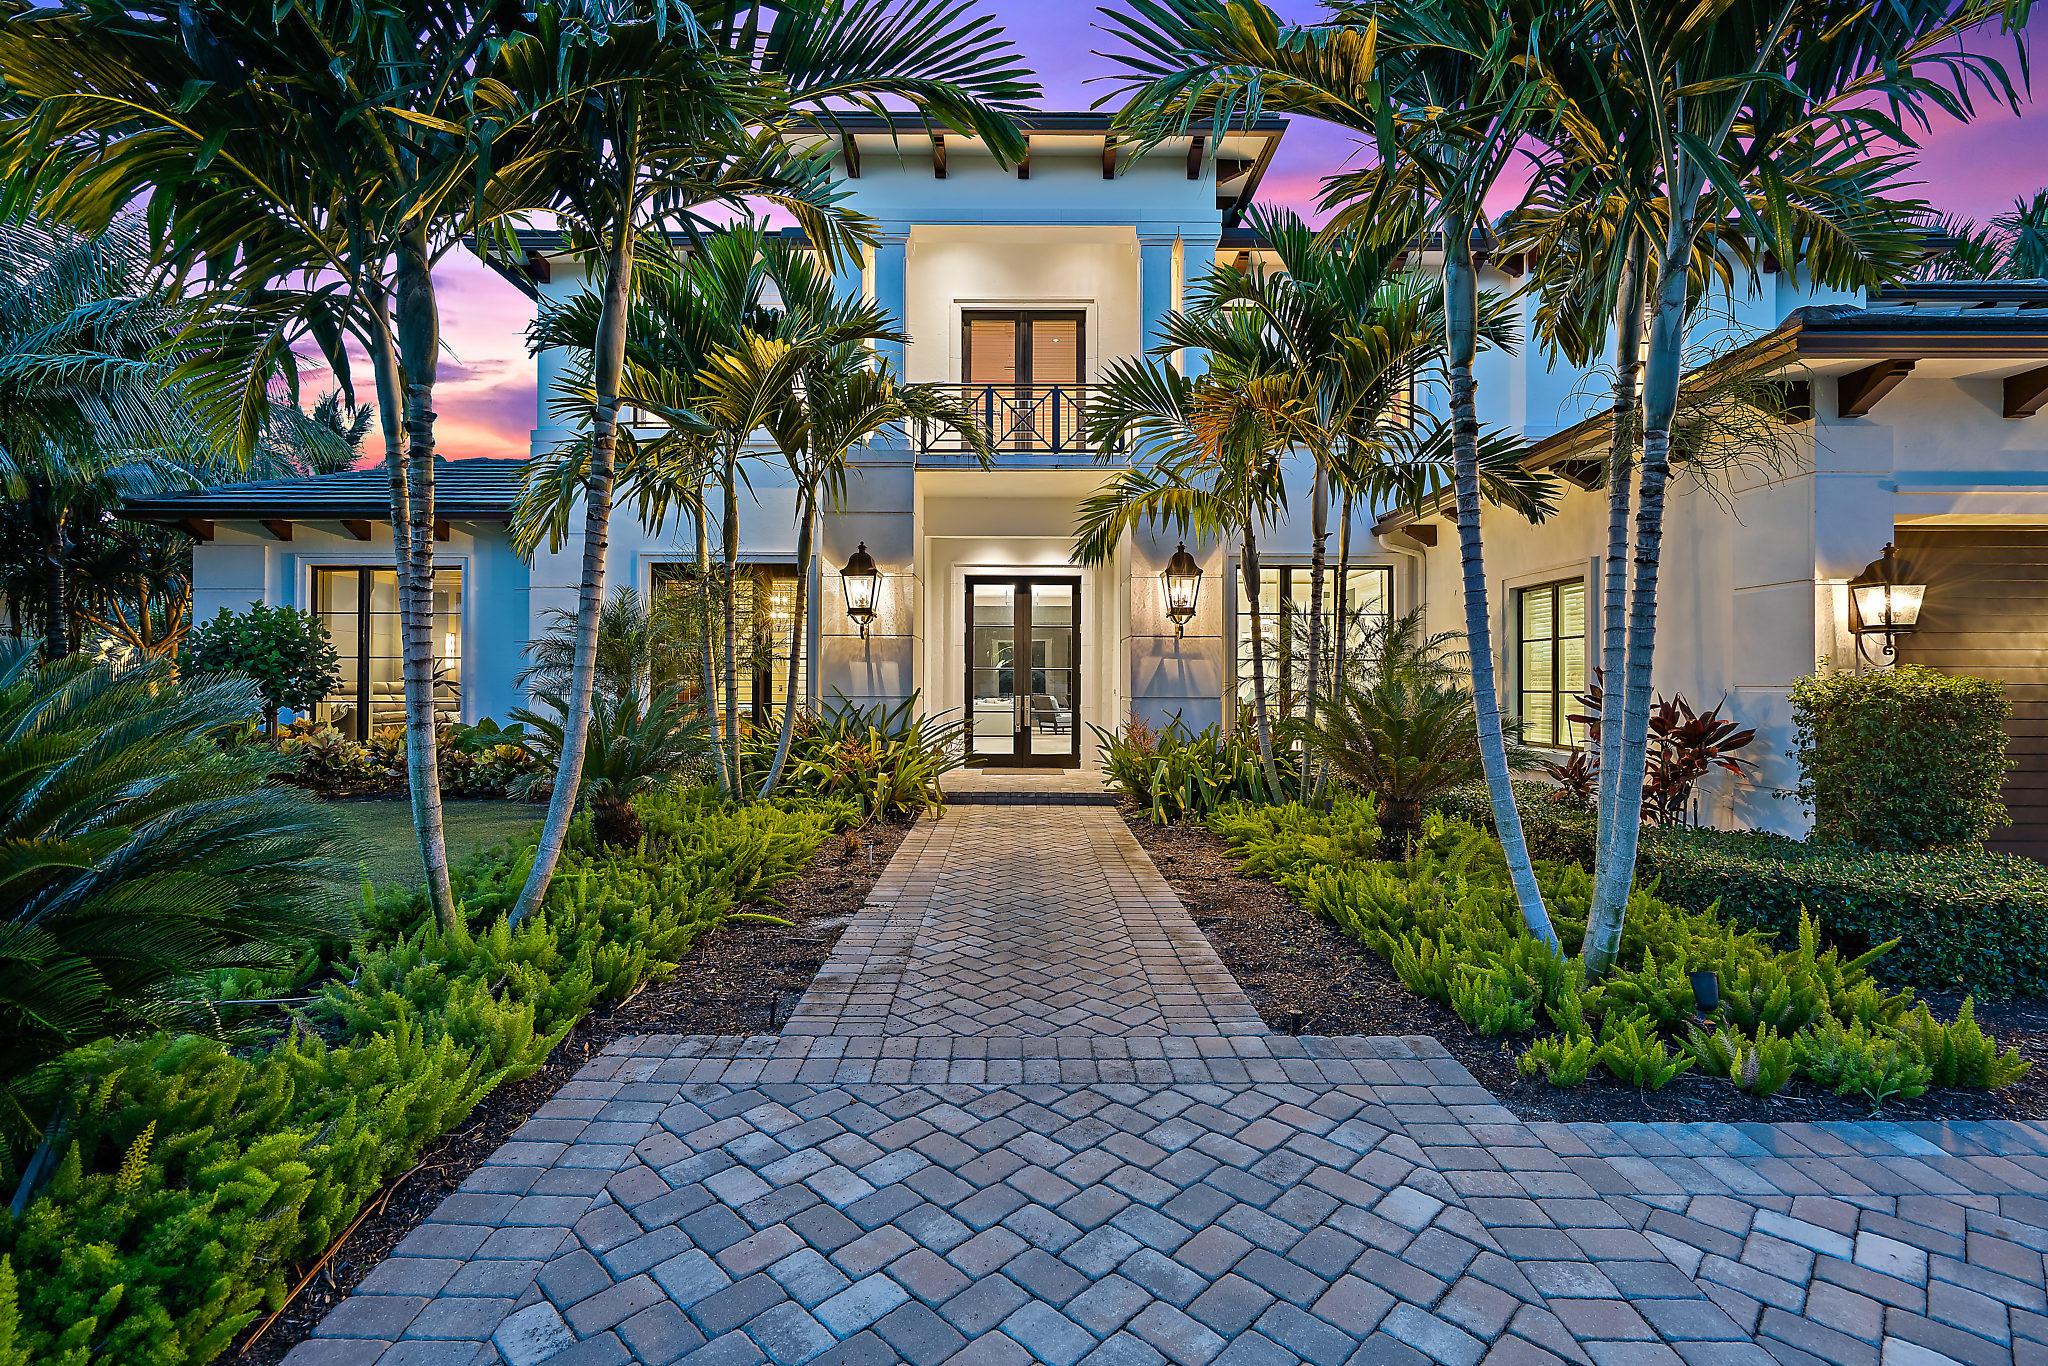 12003 Cielo Court,Palm Beach Gardens,Florida 33418,5 Bedrooms Bedrooms,7 BathroomsBathrooms,Single family detached,Cielo,RX-10568435